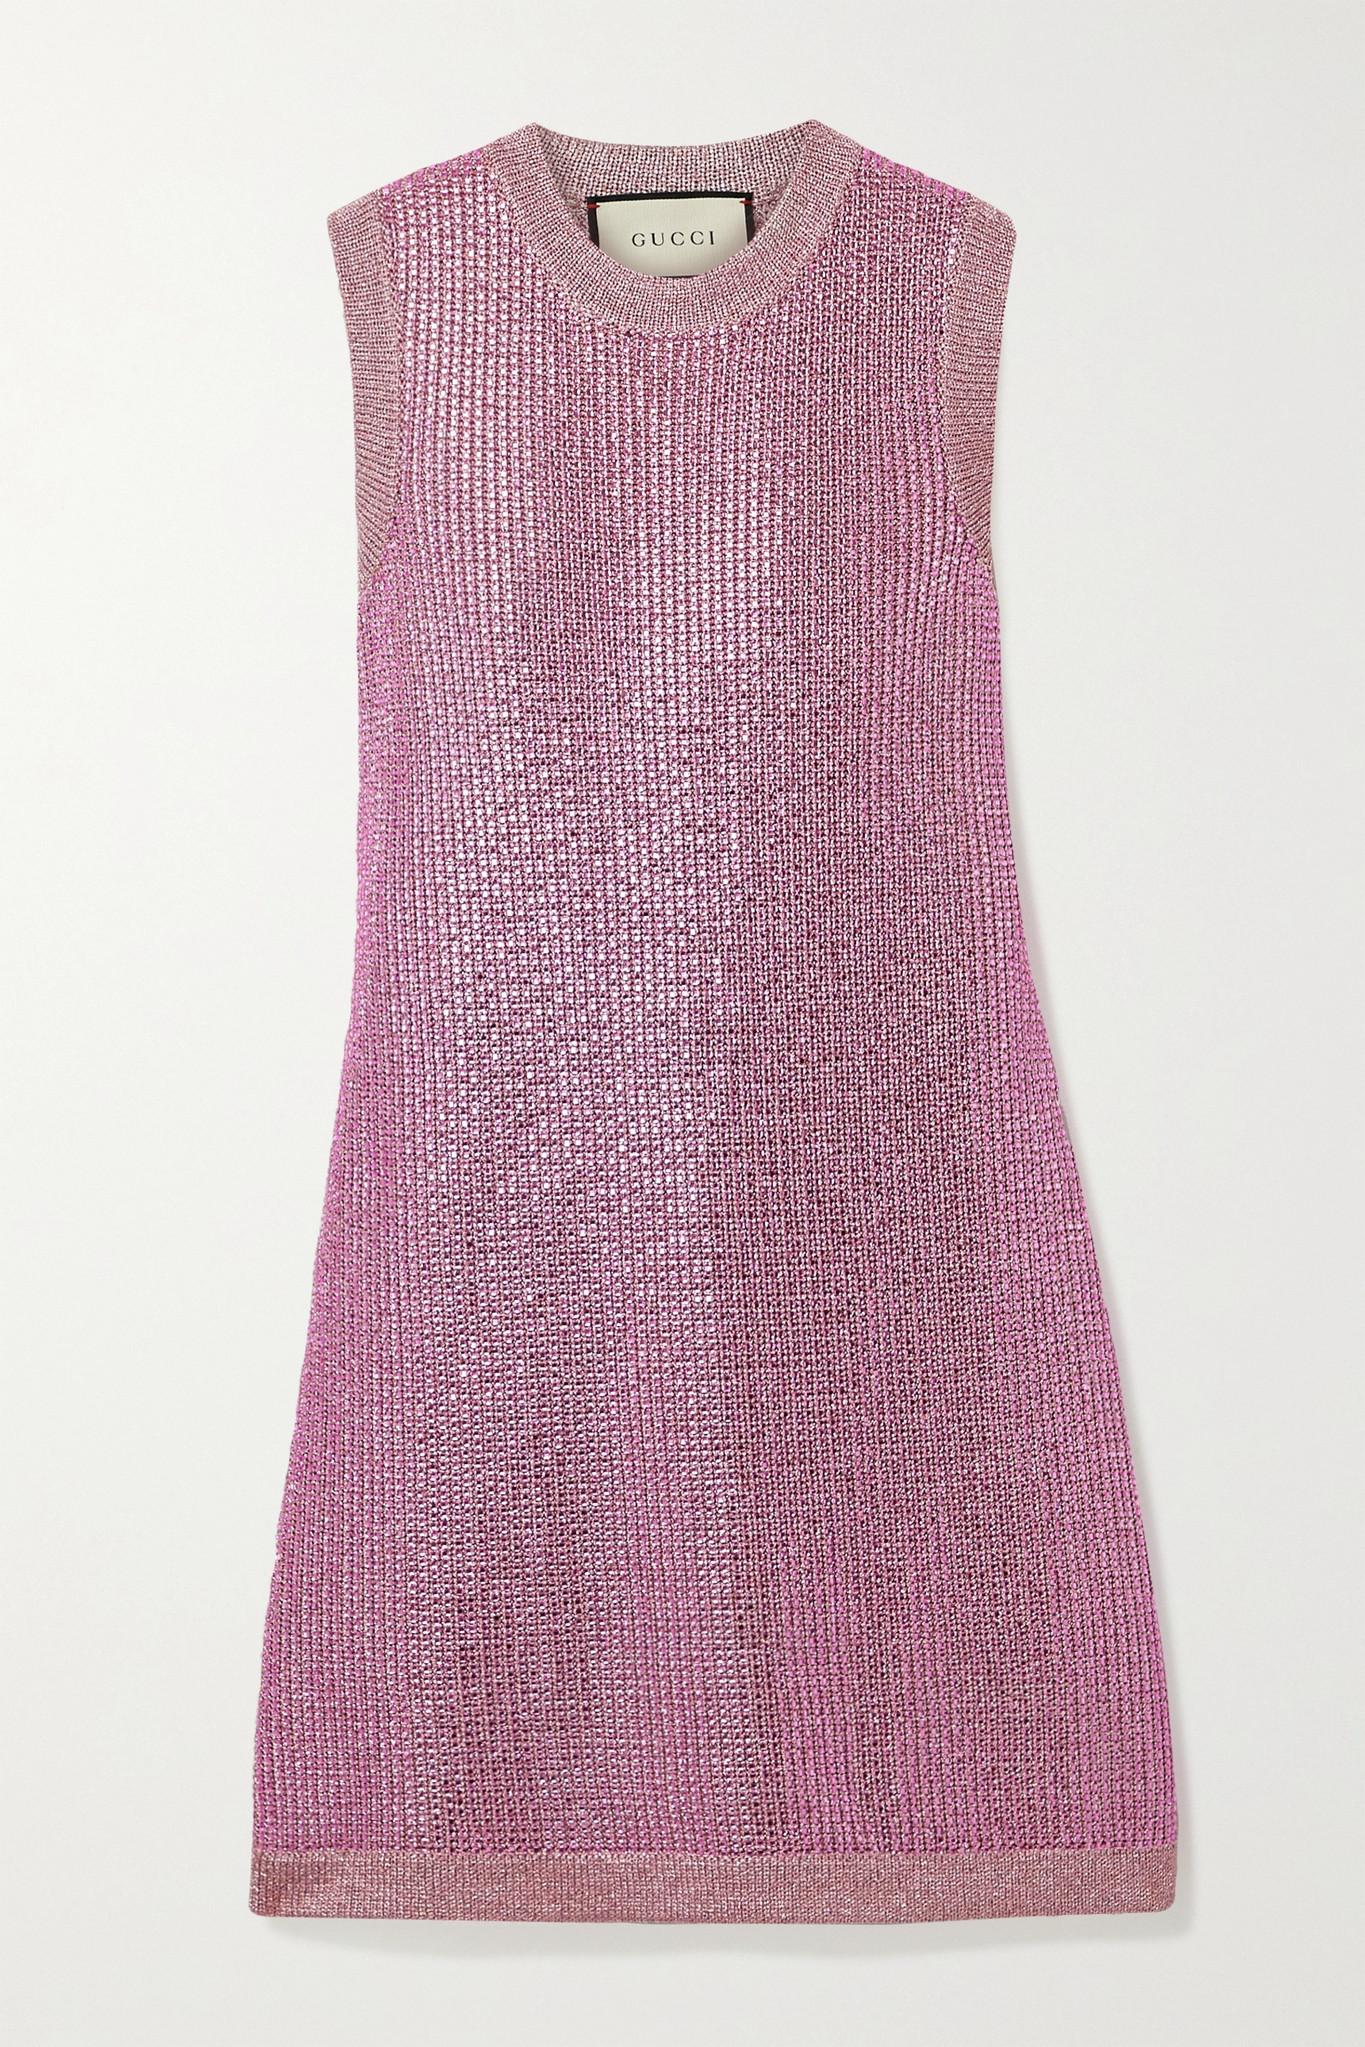 GUCCI - 水晶缀饰金属感针织迷你连衣裙 - 粉红色 - small